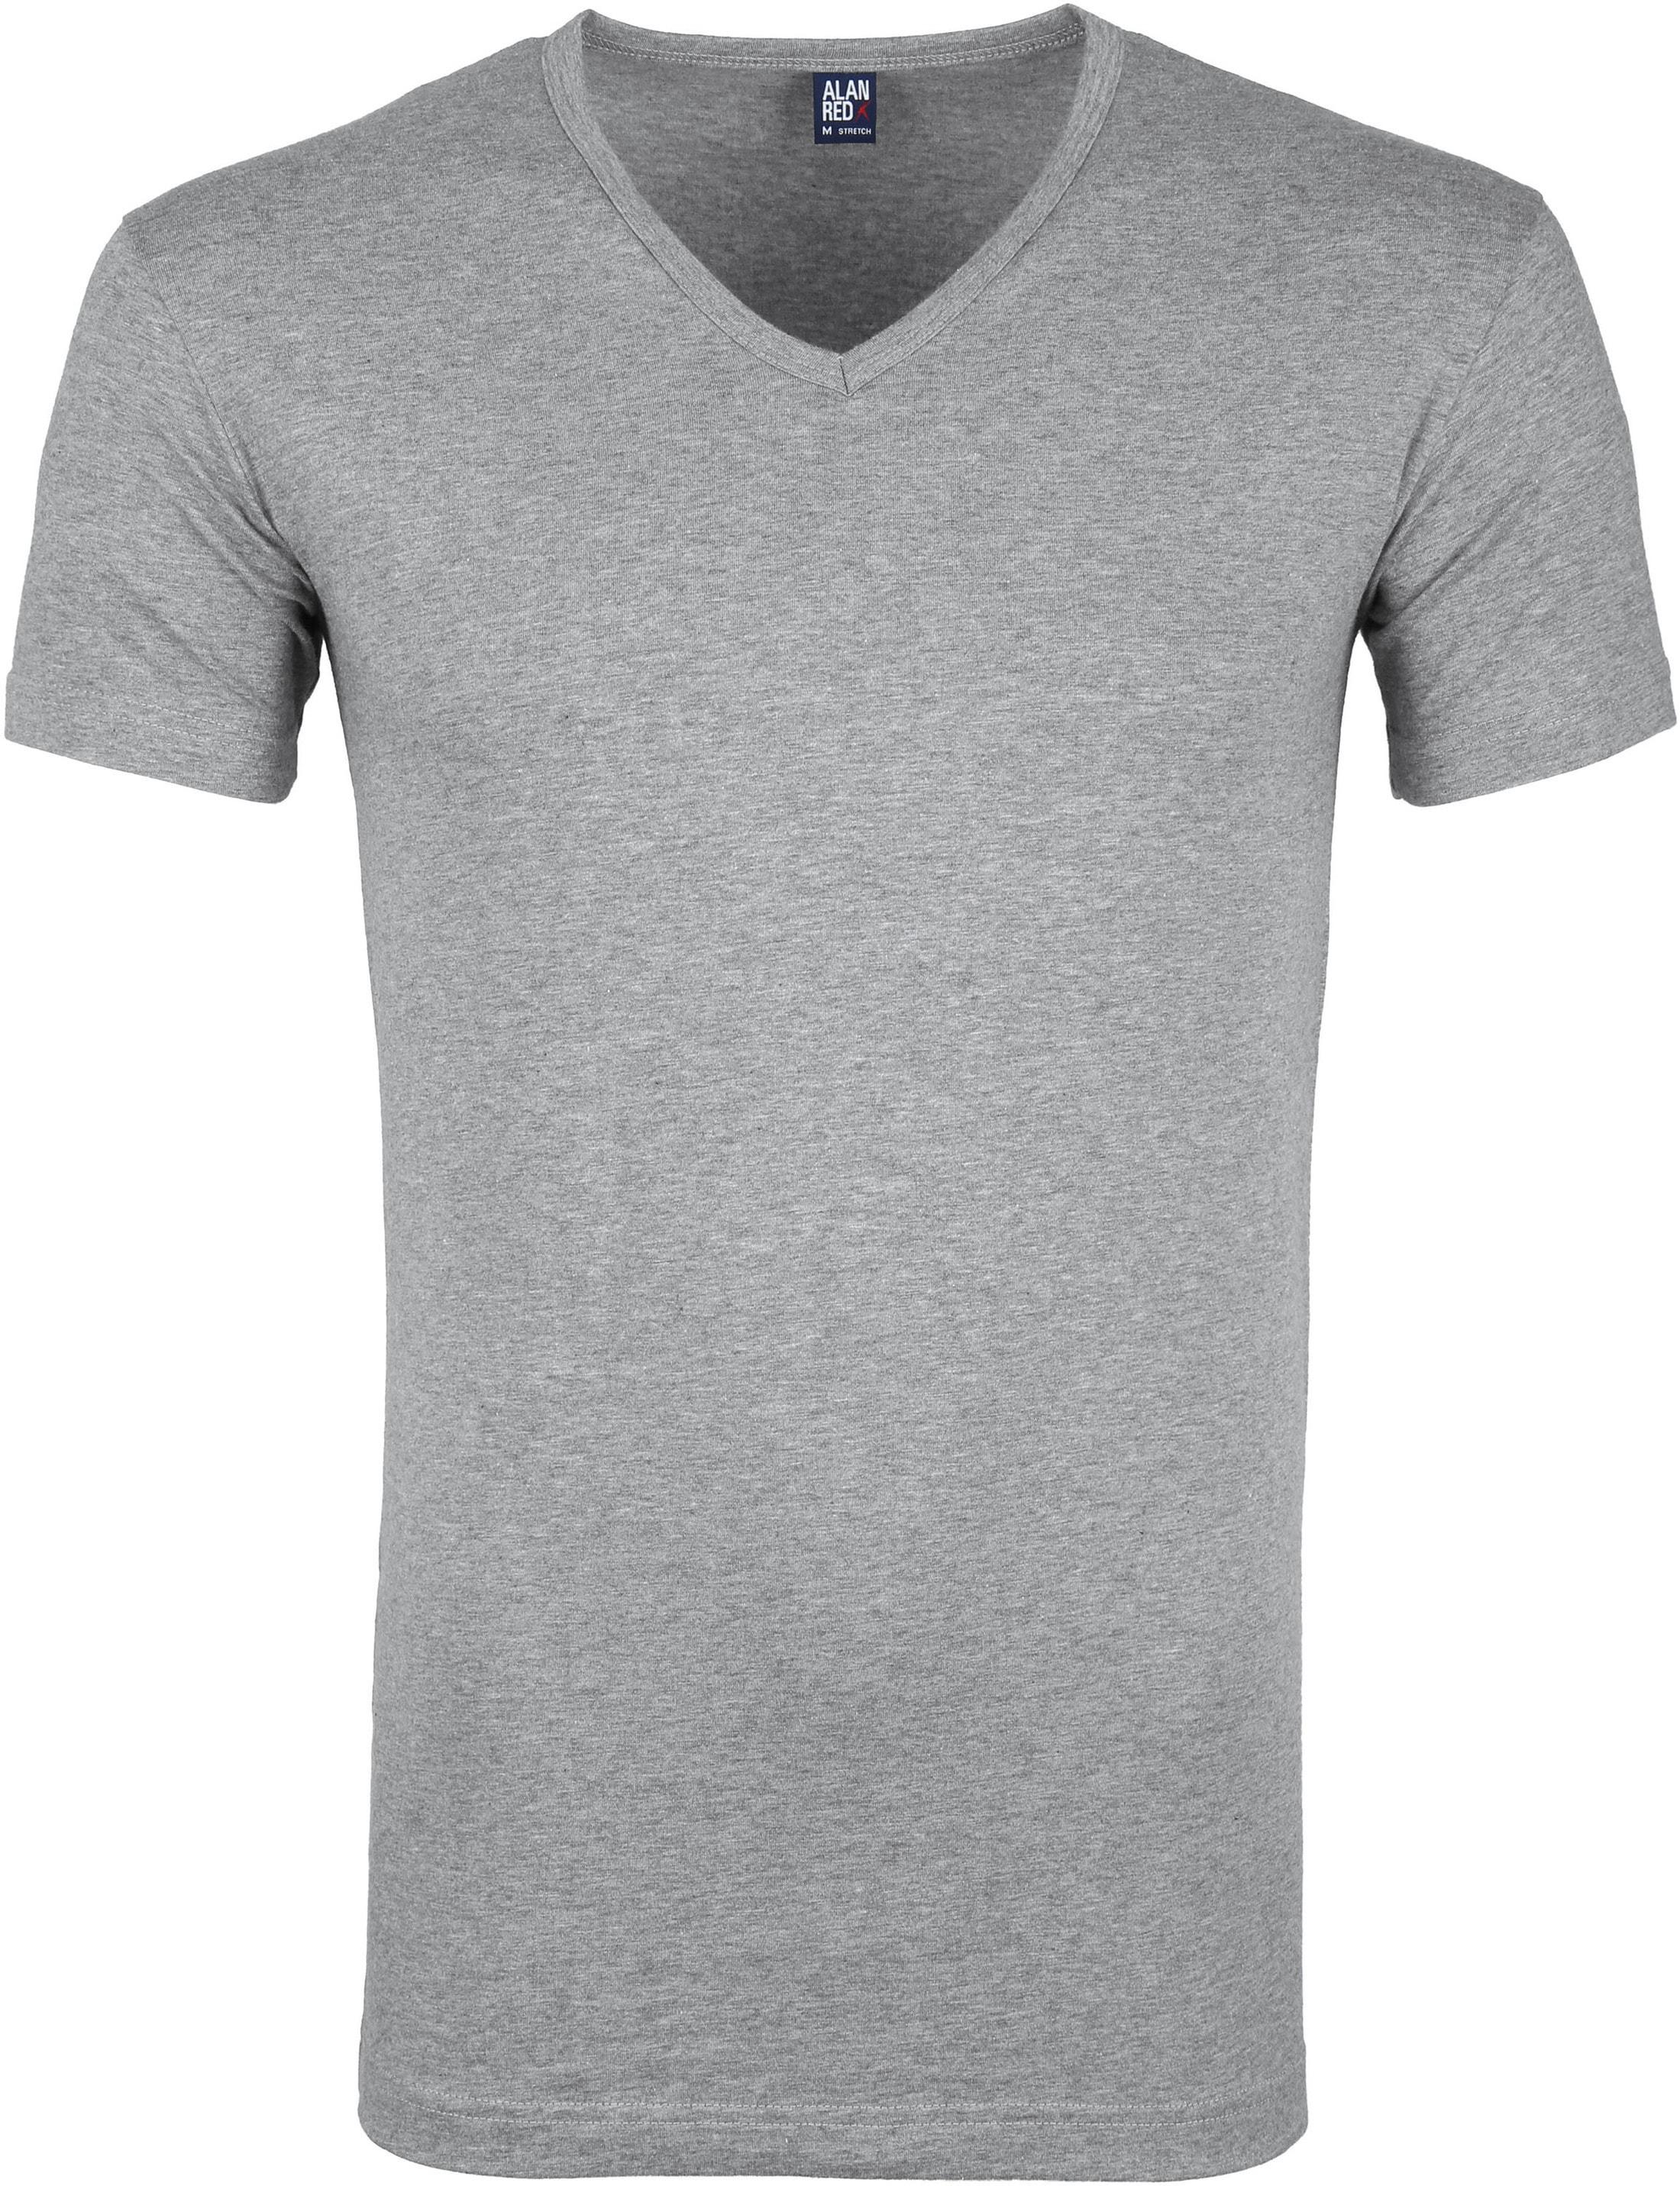 Alan Red Oklahoma T-shirt Stretch Grijs (2pack) foto 1